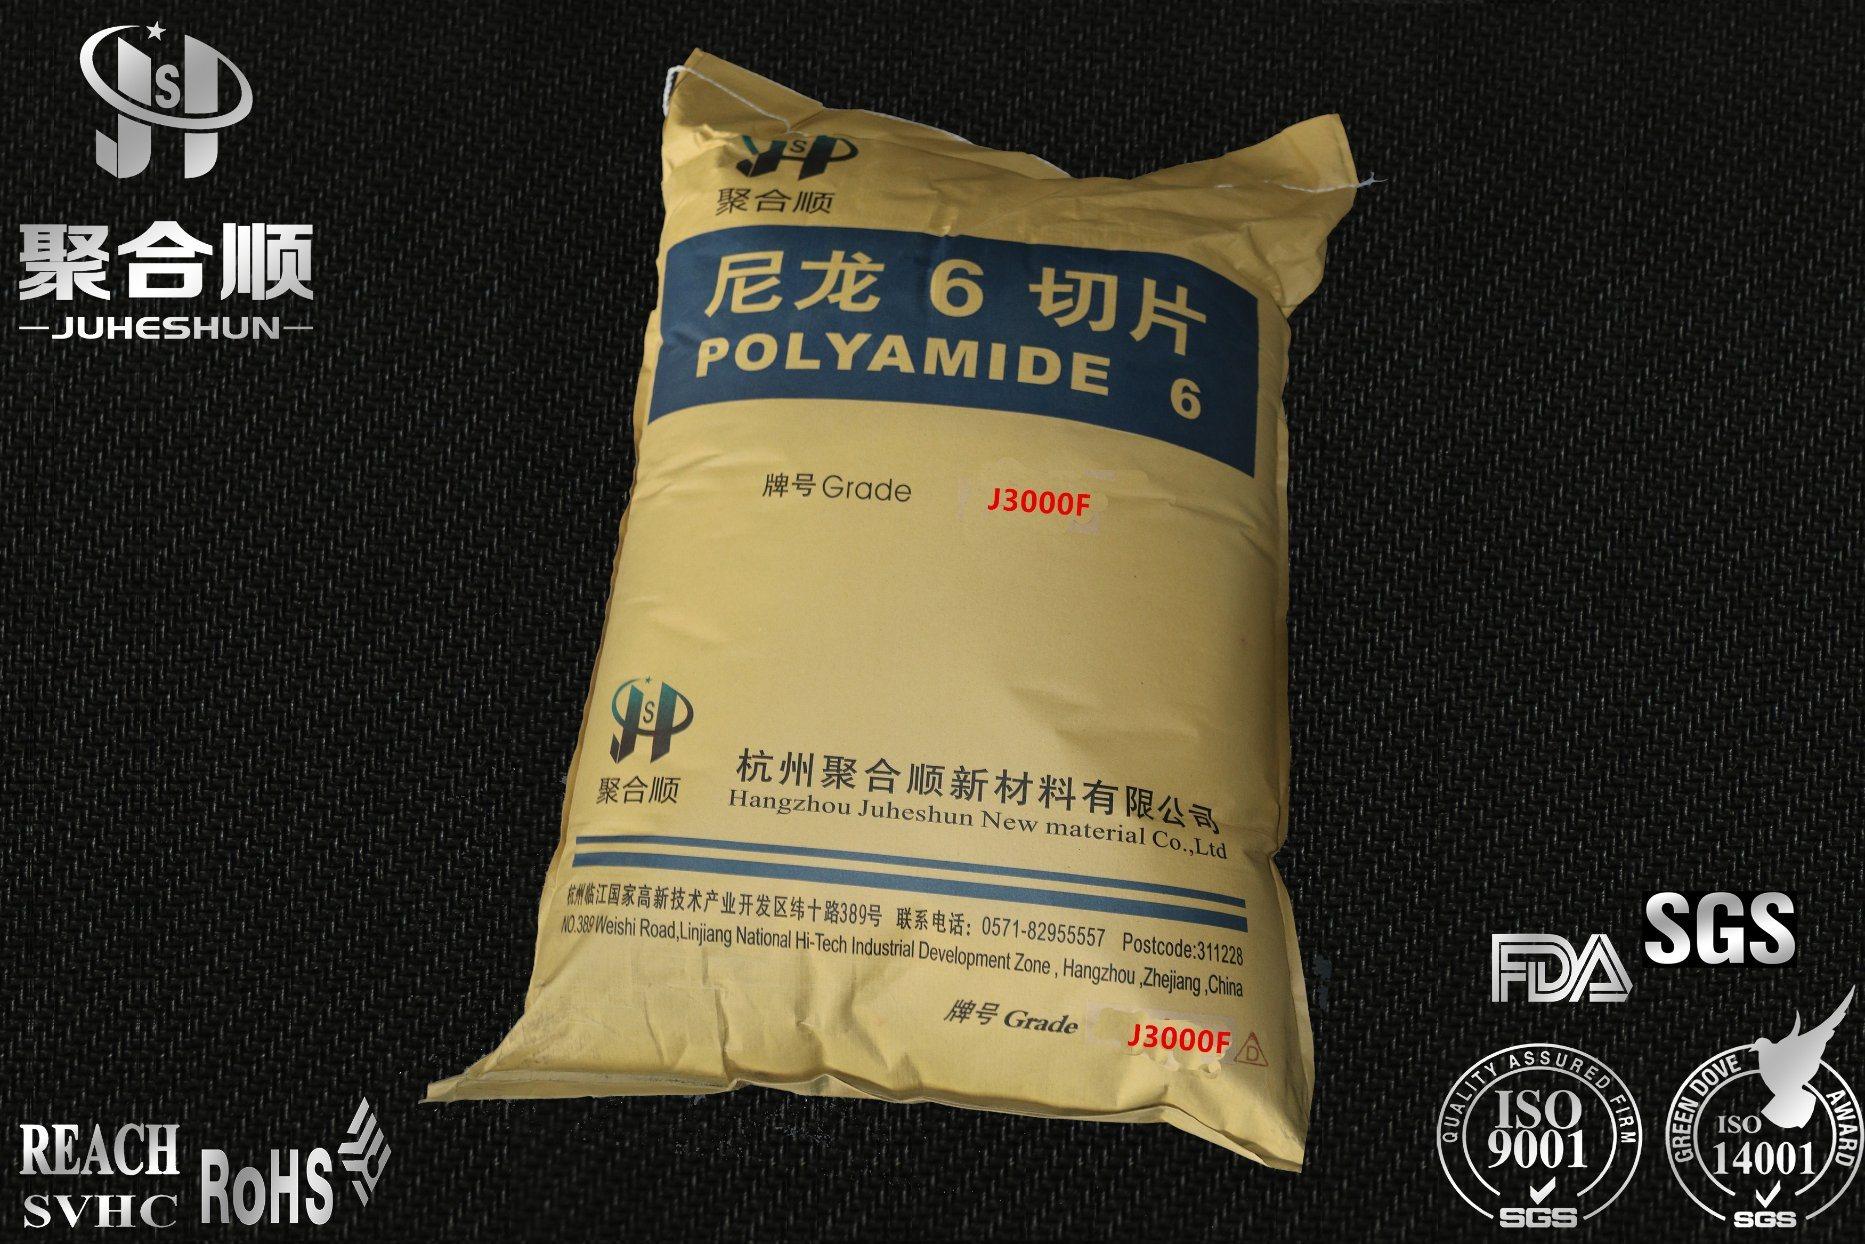 J3000f/Film Grade Nylon6 Chips/Nylon-6/Polyamide Granules/Pellets/Nylon6 Chips/Slice/PA6